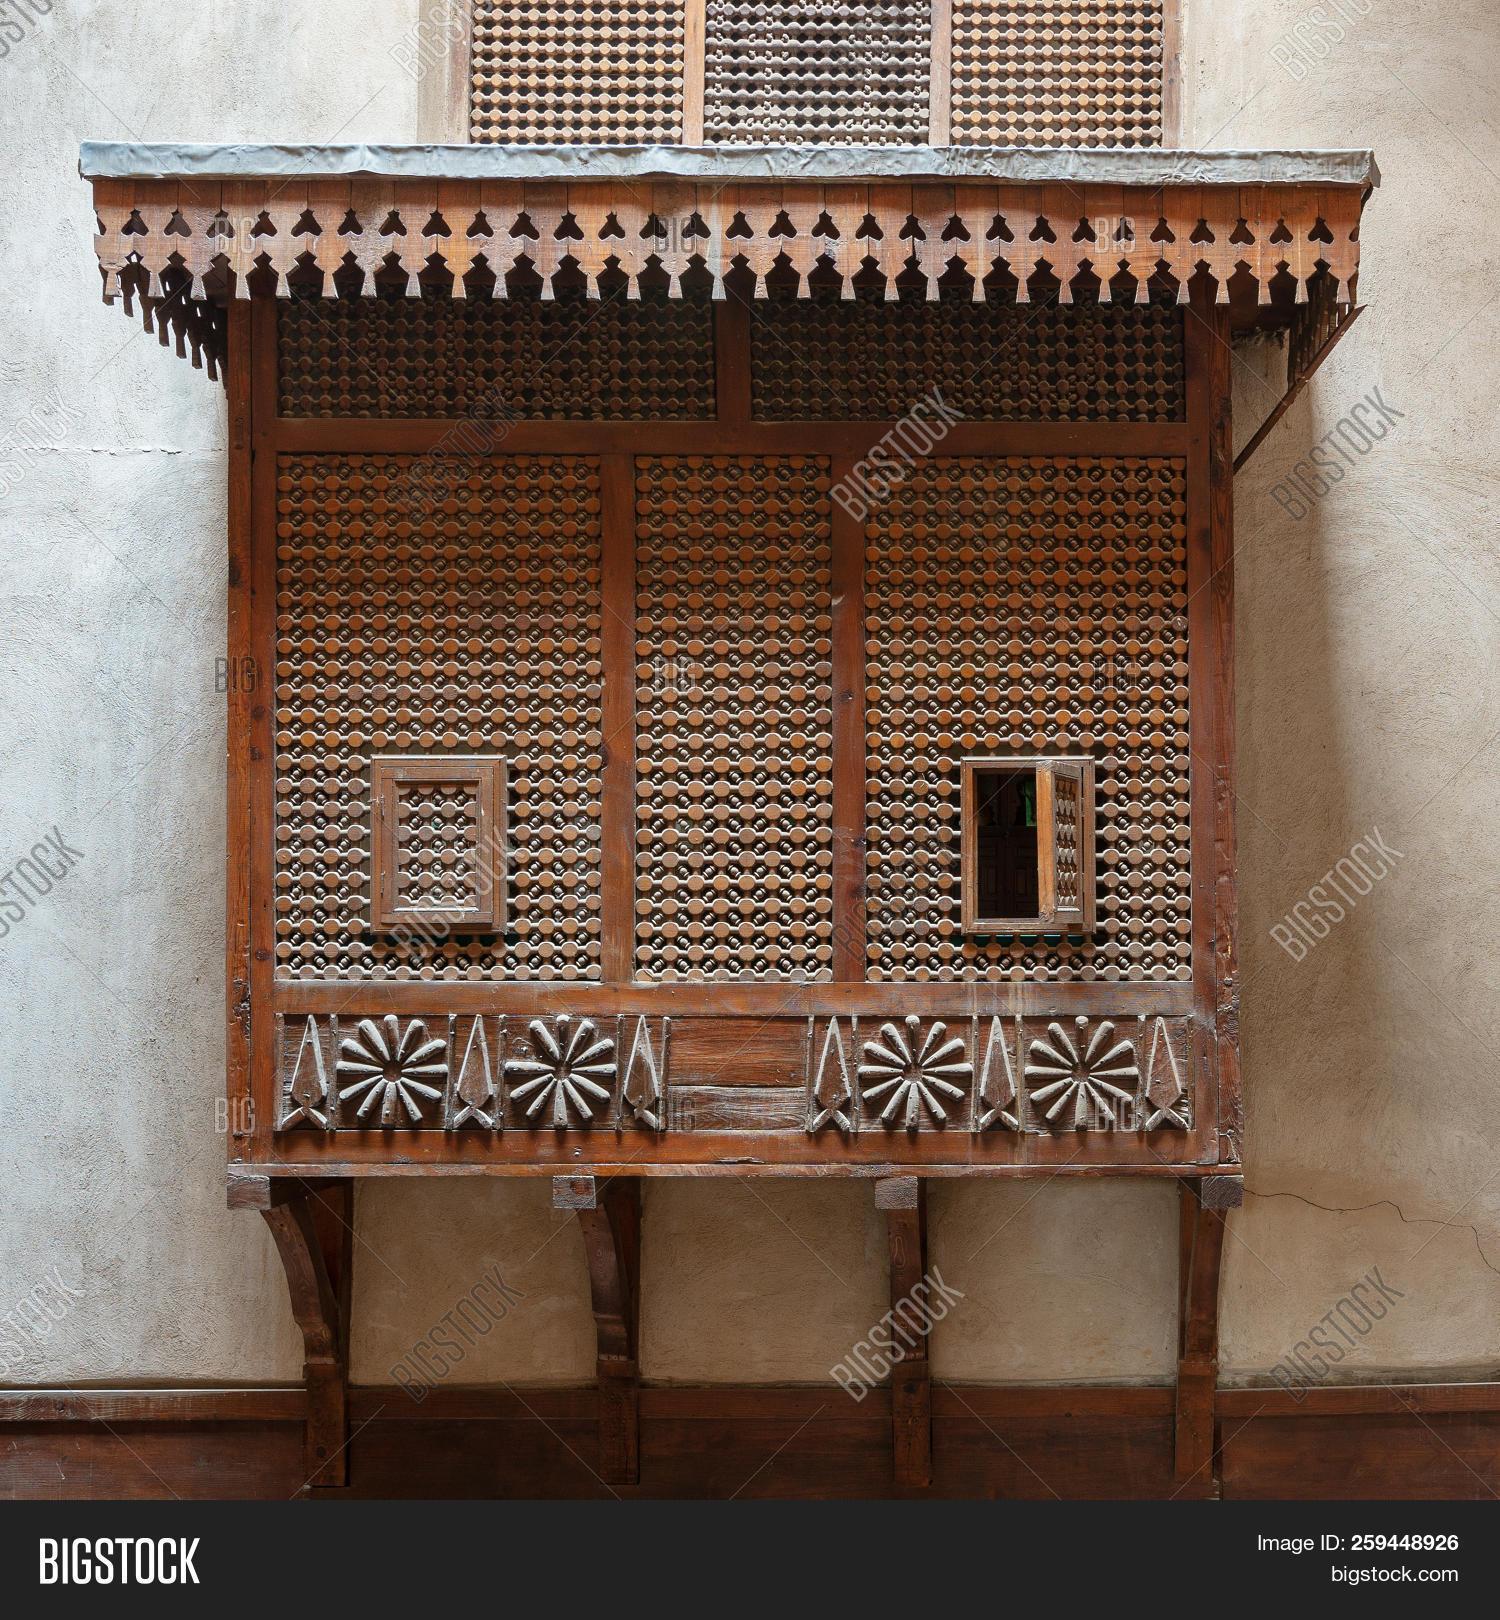 Descargar Epub Mamluk Era Style Oriel Image & Photo (Free